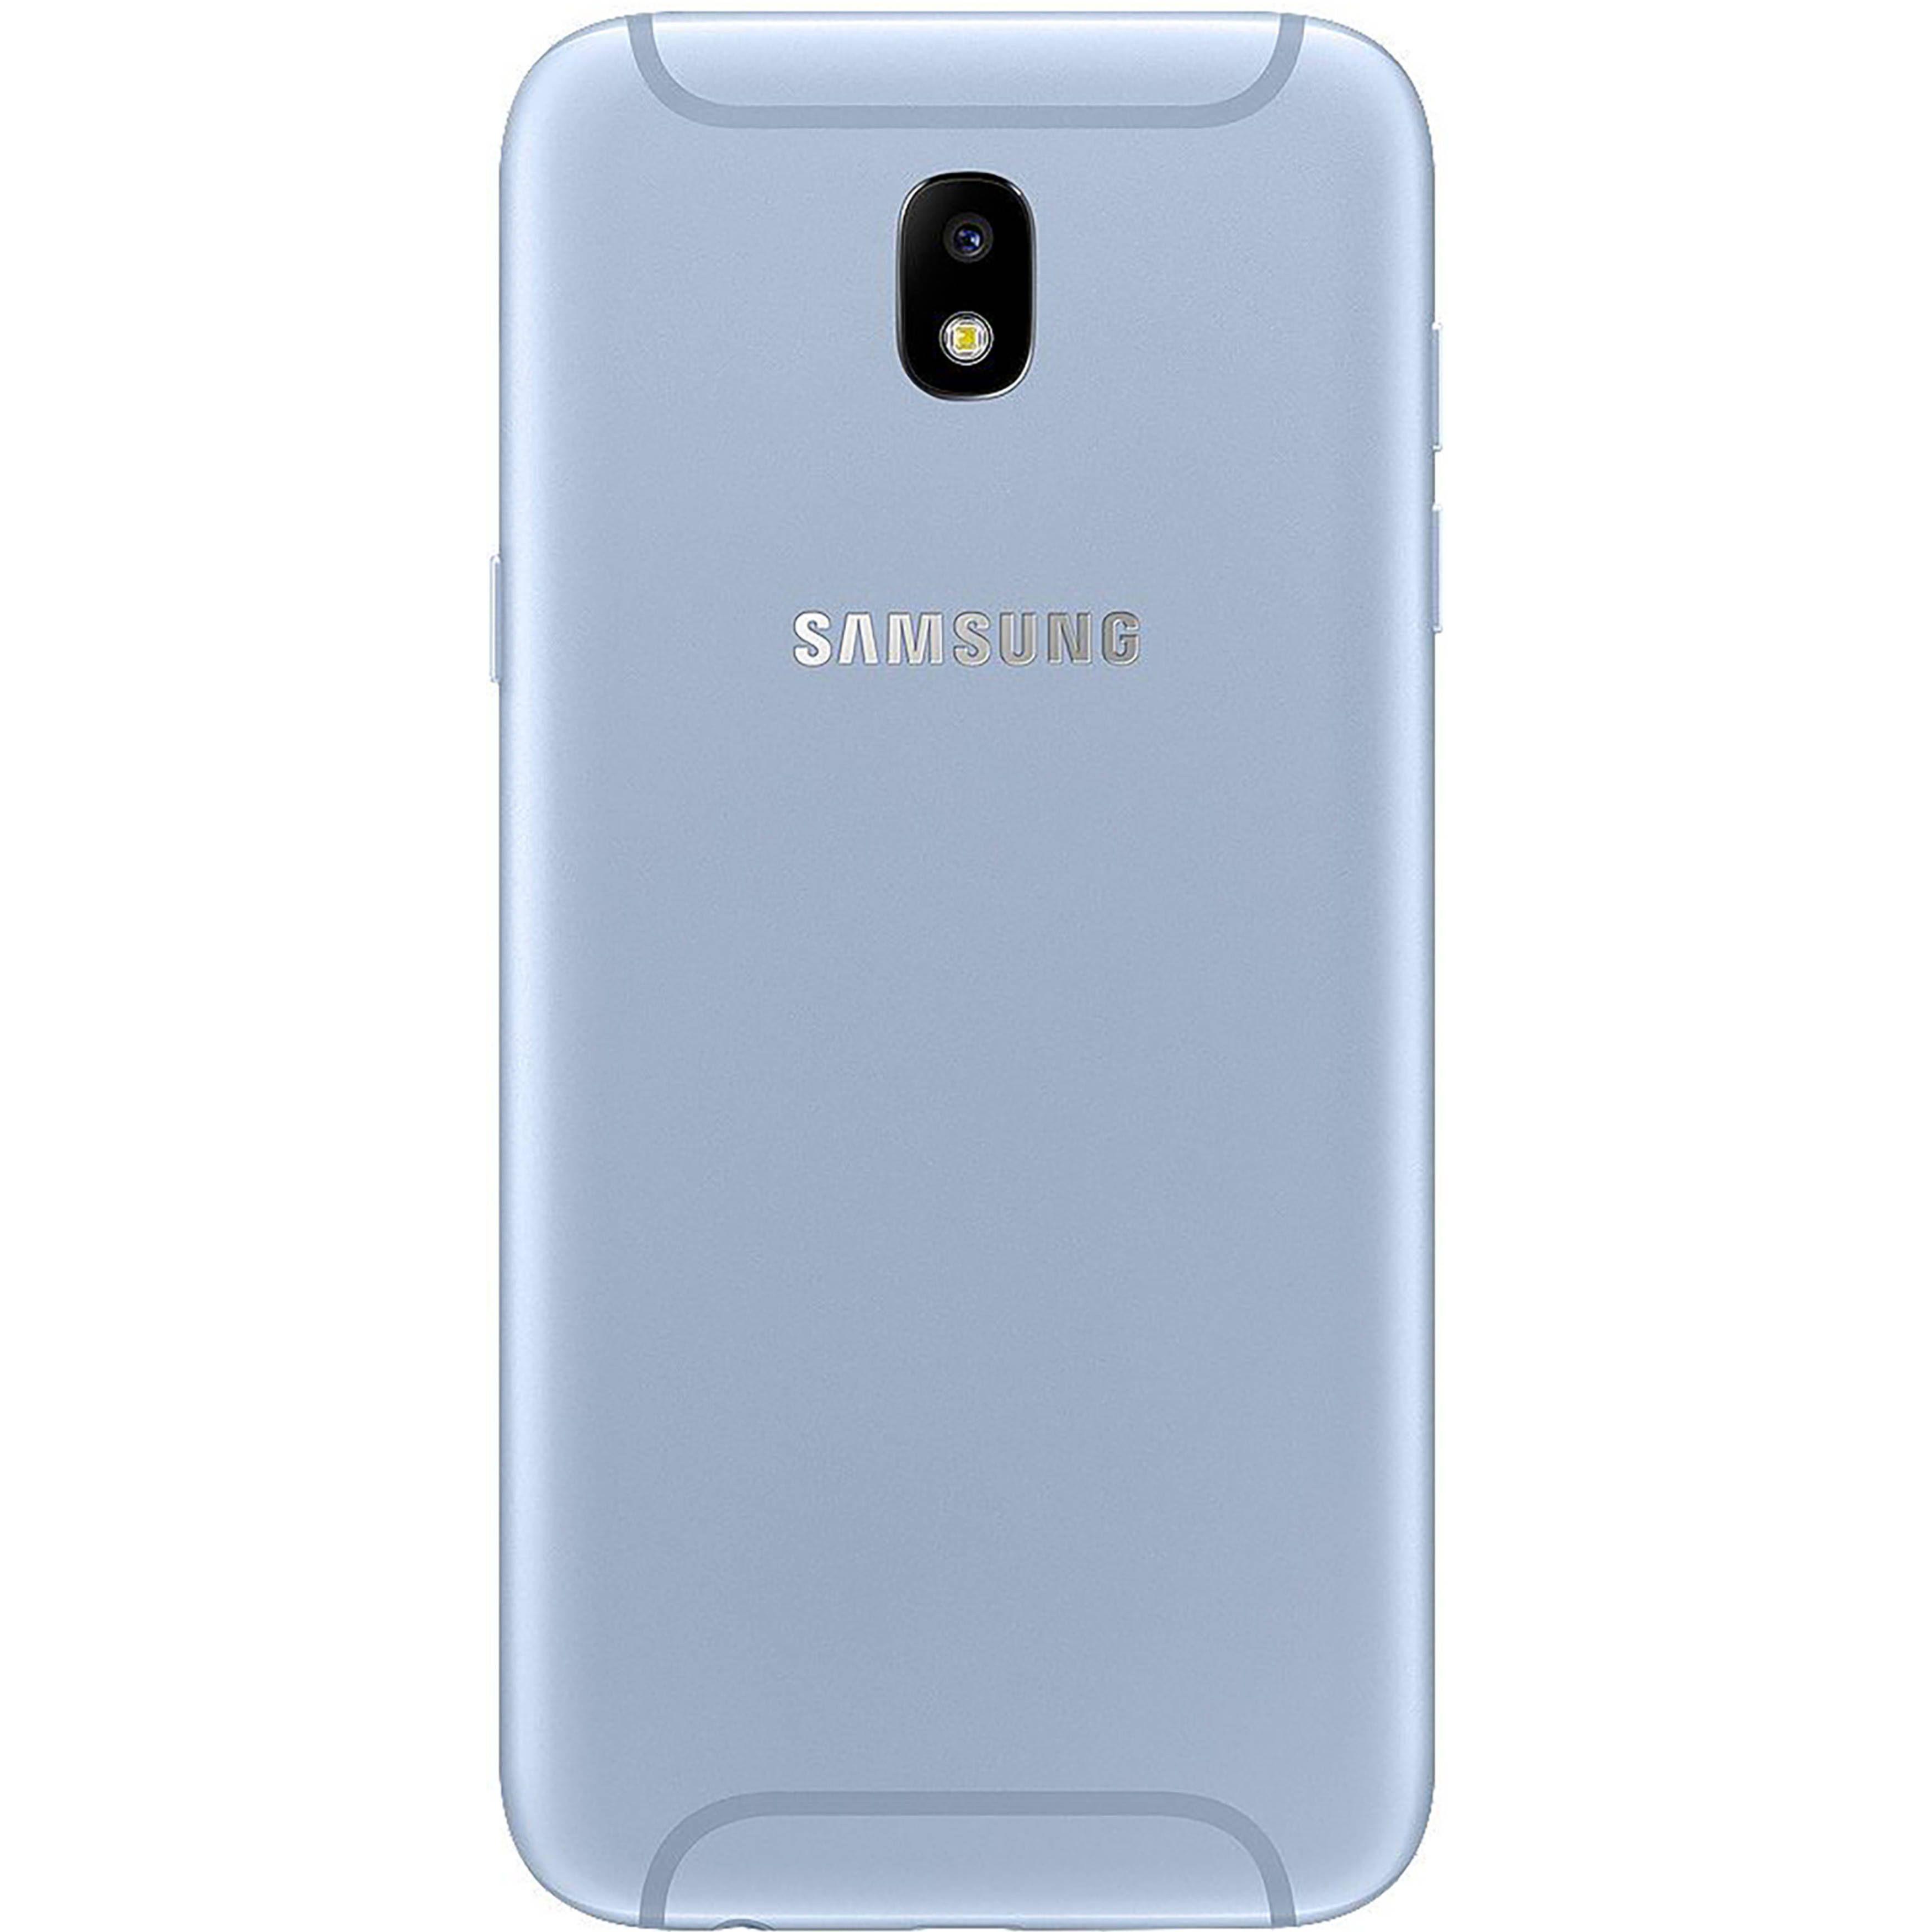 0134d6ccb5b Samsung Galaxy J5 Pro J530G 16GB Unlocked GSM Phone w/ 13MP Rear + Front  Camera - #SM-J530G